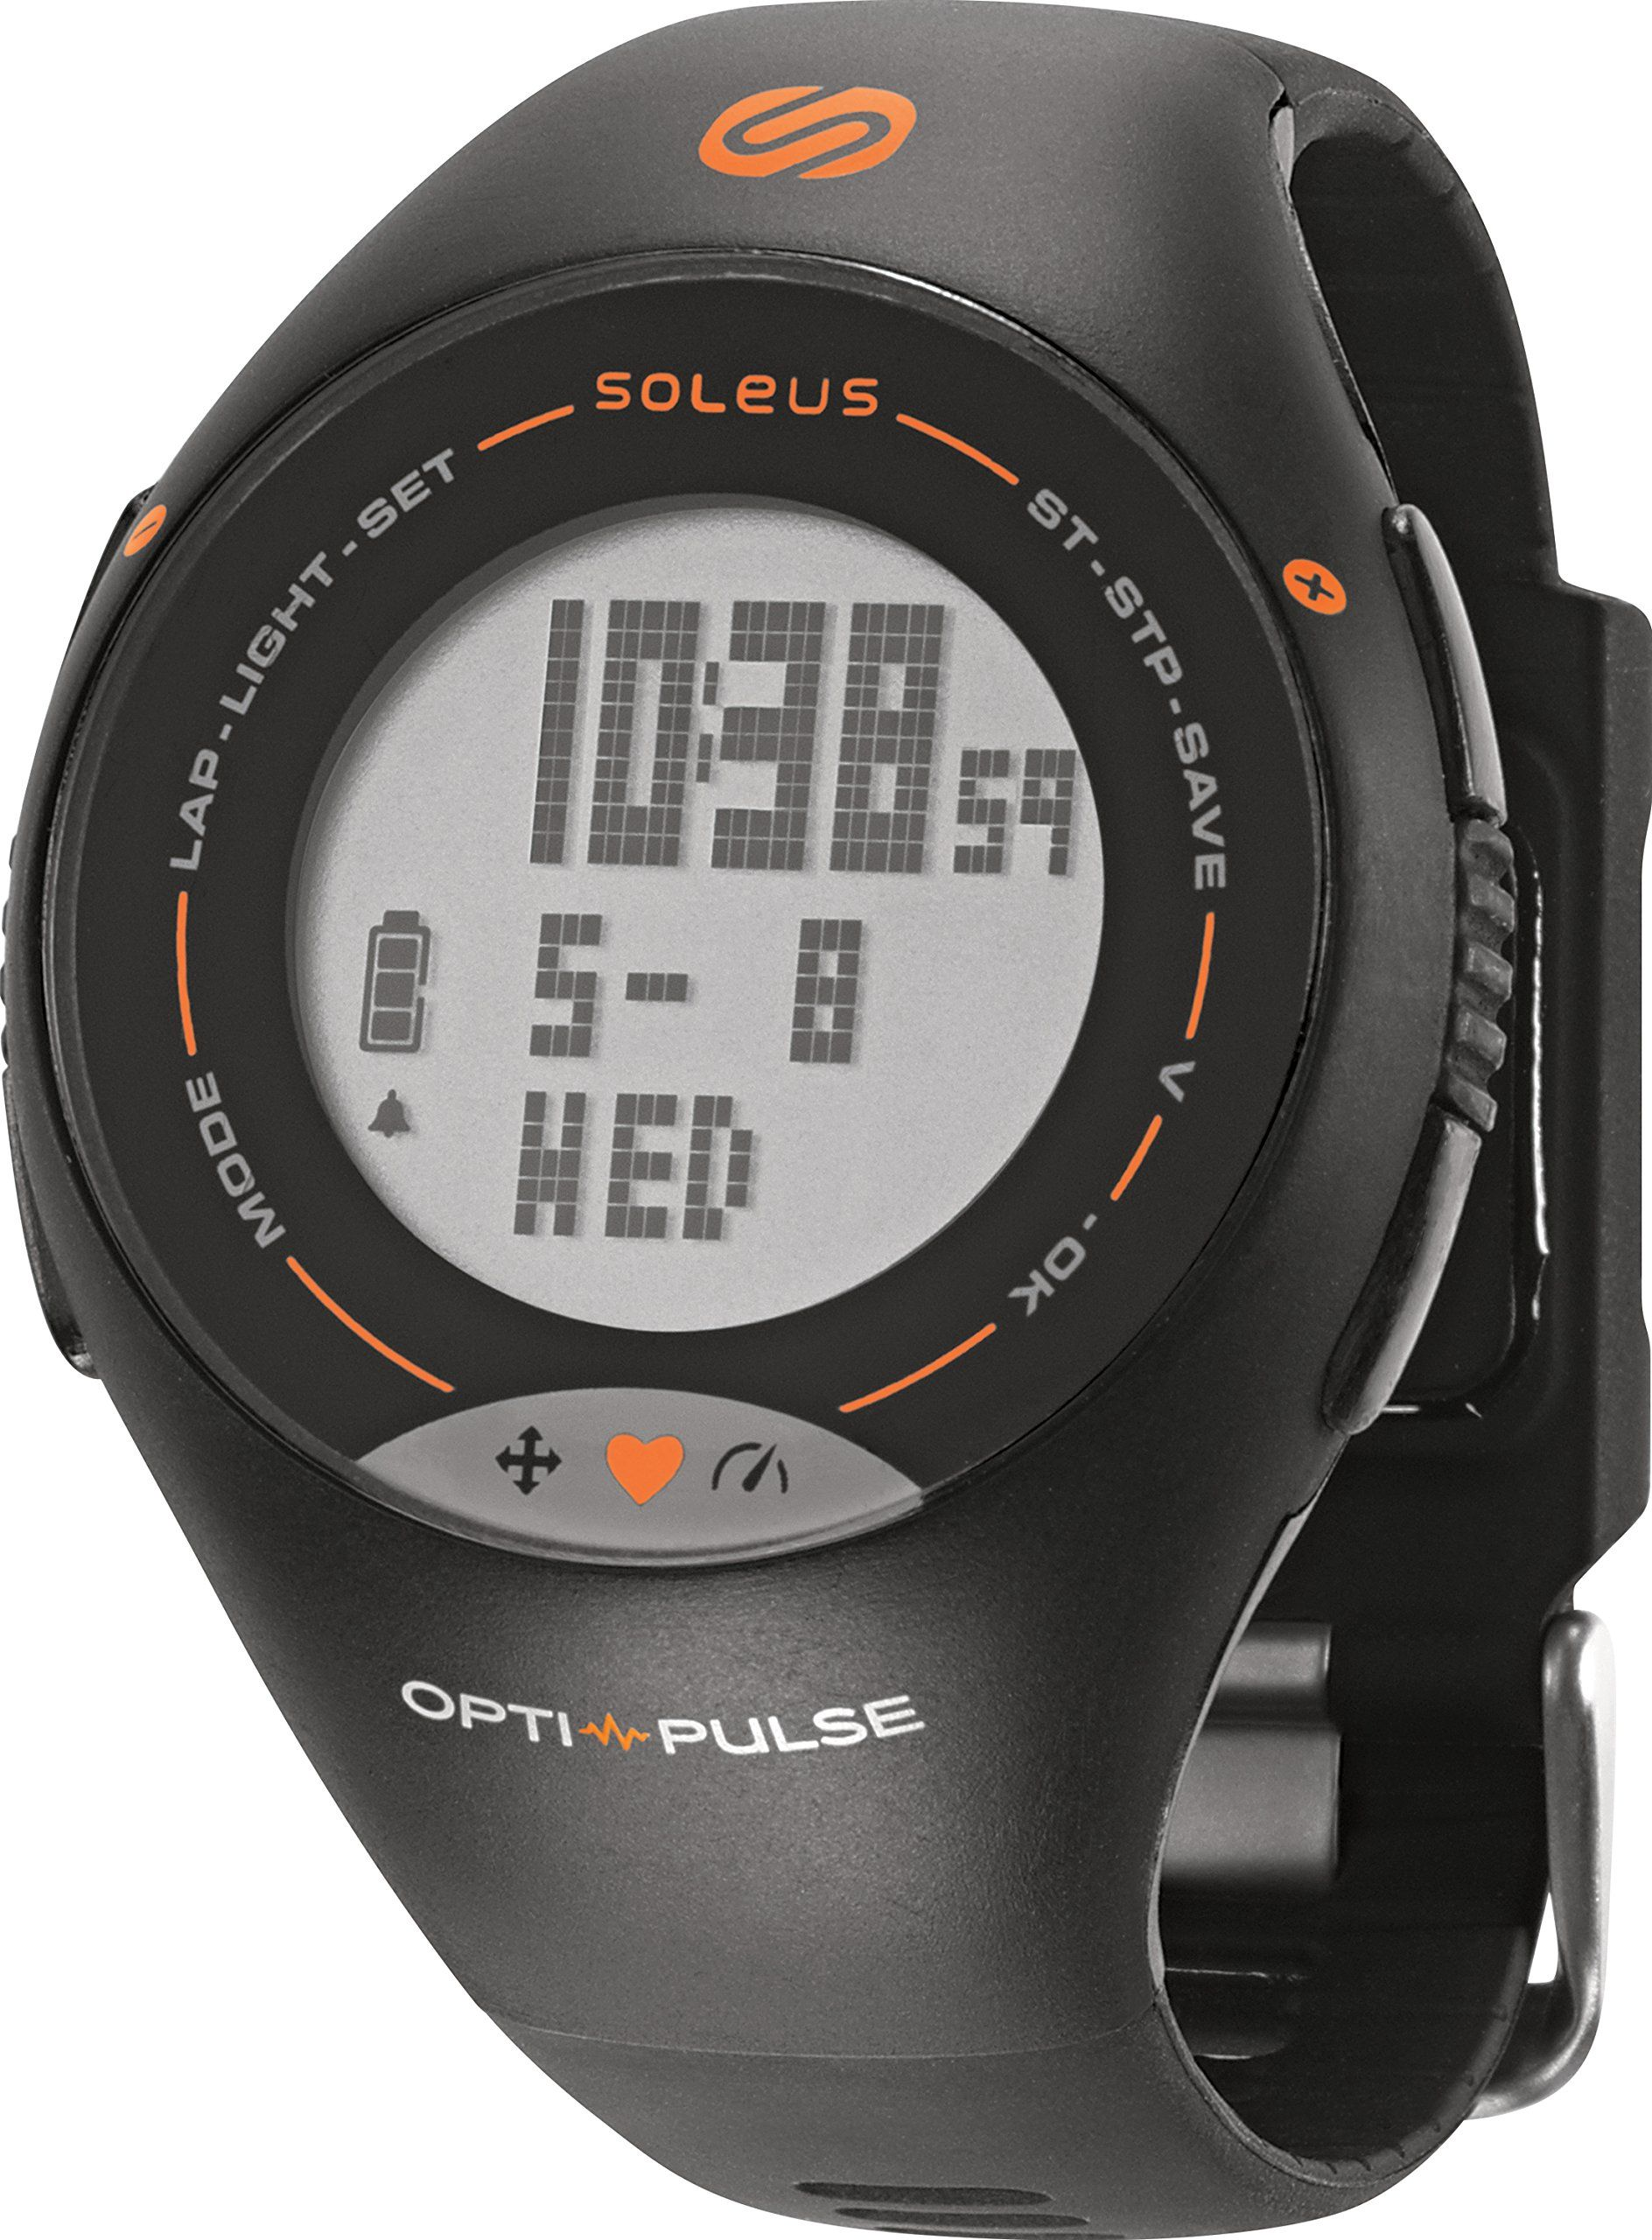 Watch with wrist hrm - Soleus Unisex Sh006 030 Pulse Hrm Digital Display Quartz Black Watch Wrist Based Hrm